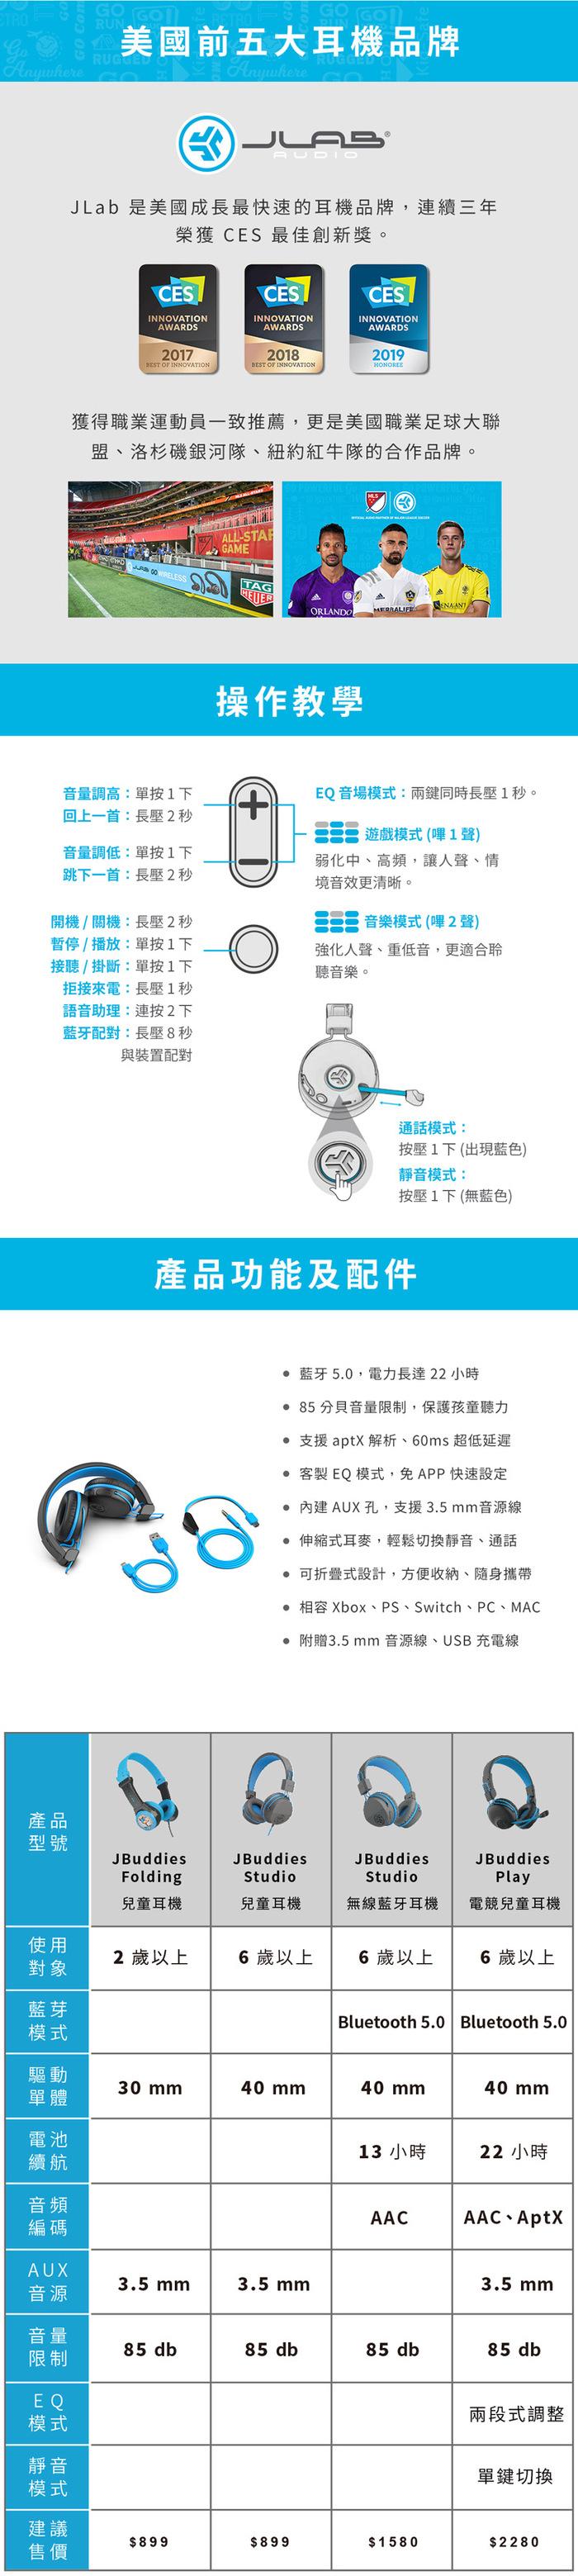 JLab|JBuddies Play 電競兒童耳機